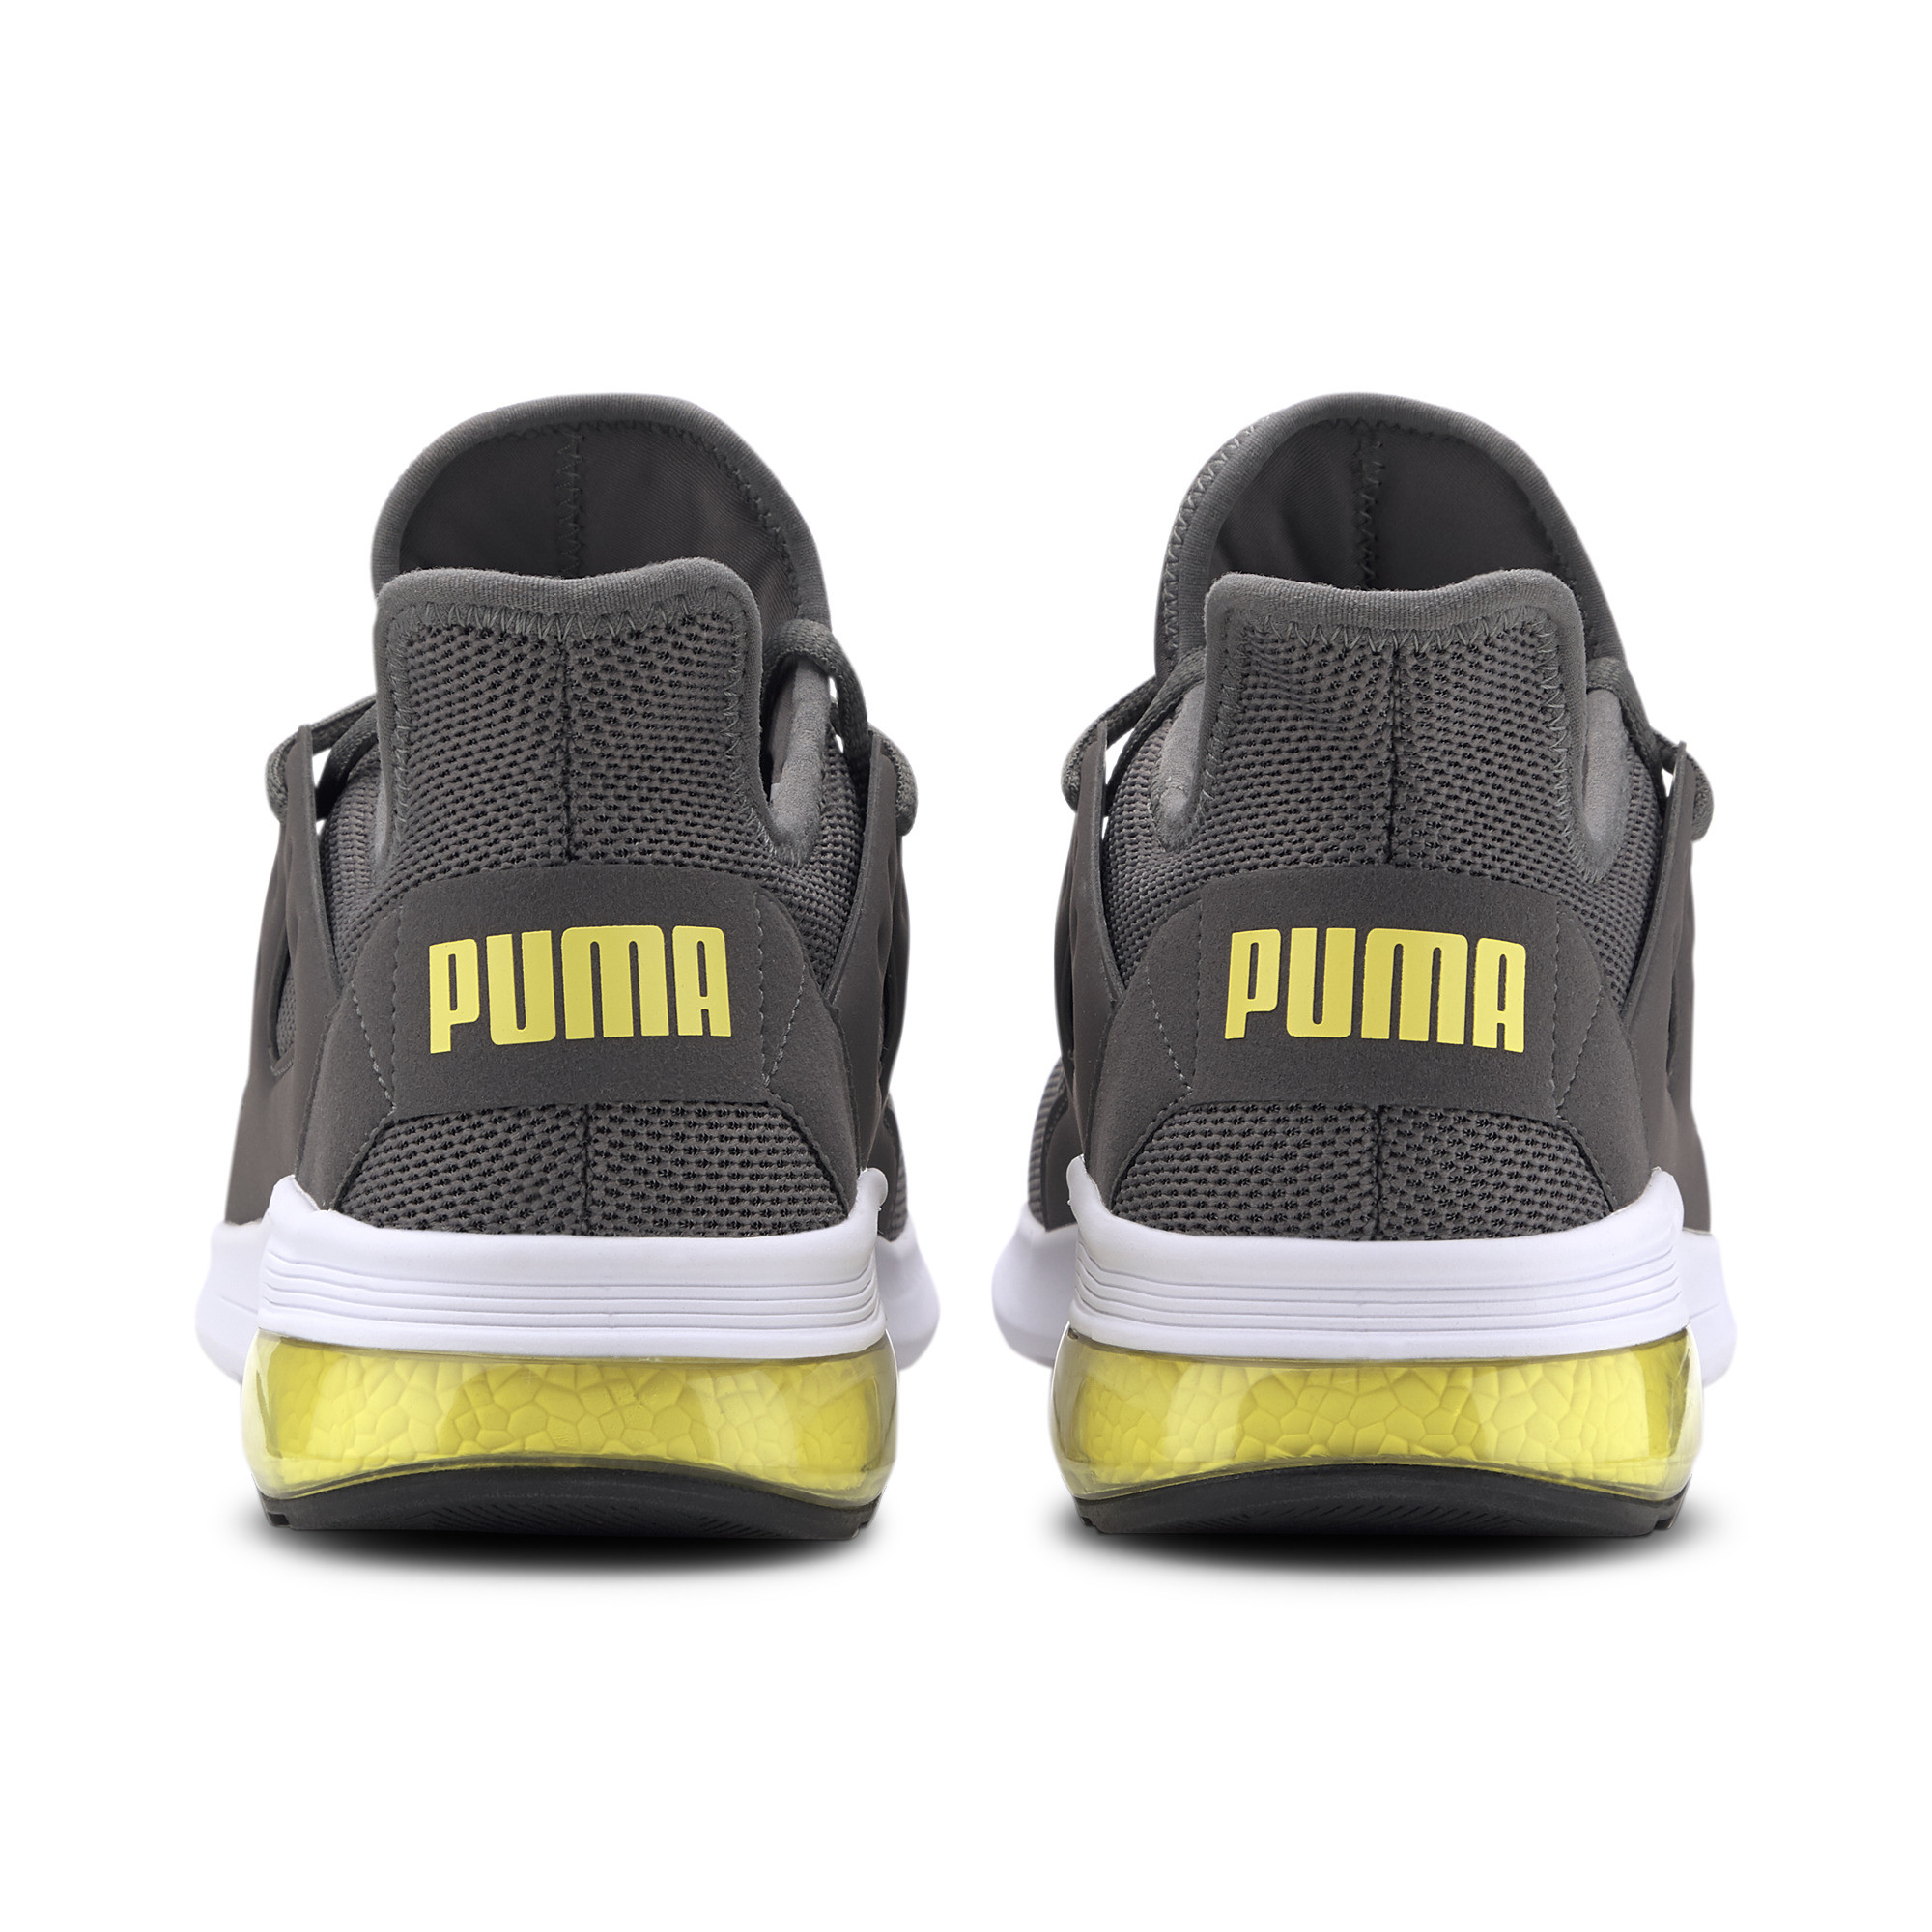 PUMA-Men-039-s-Electron-Street-Sneakers thumbnail 18